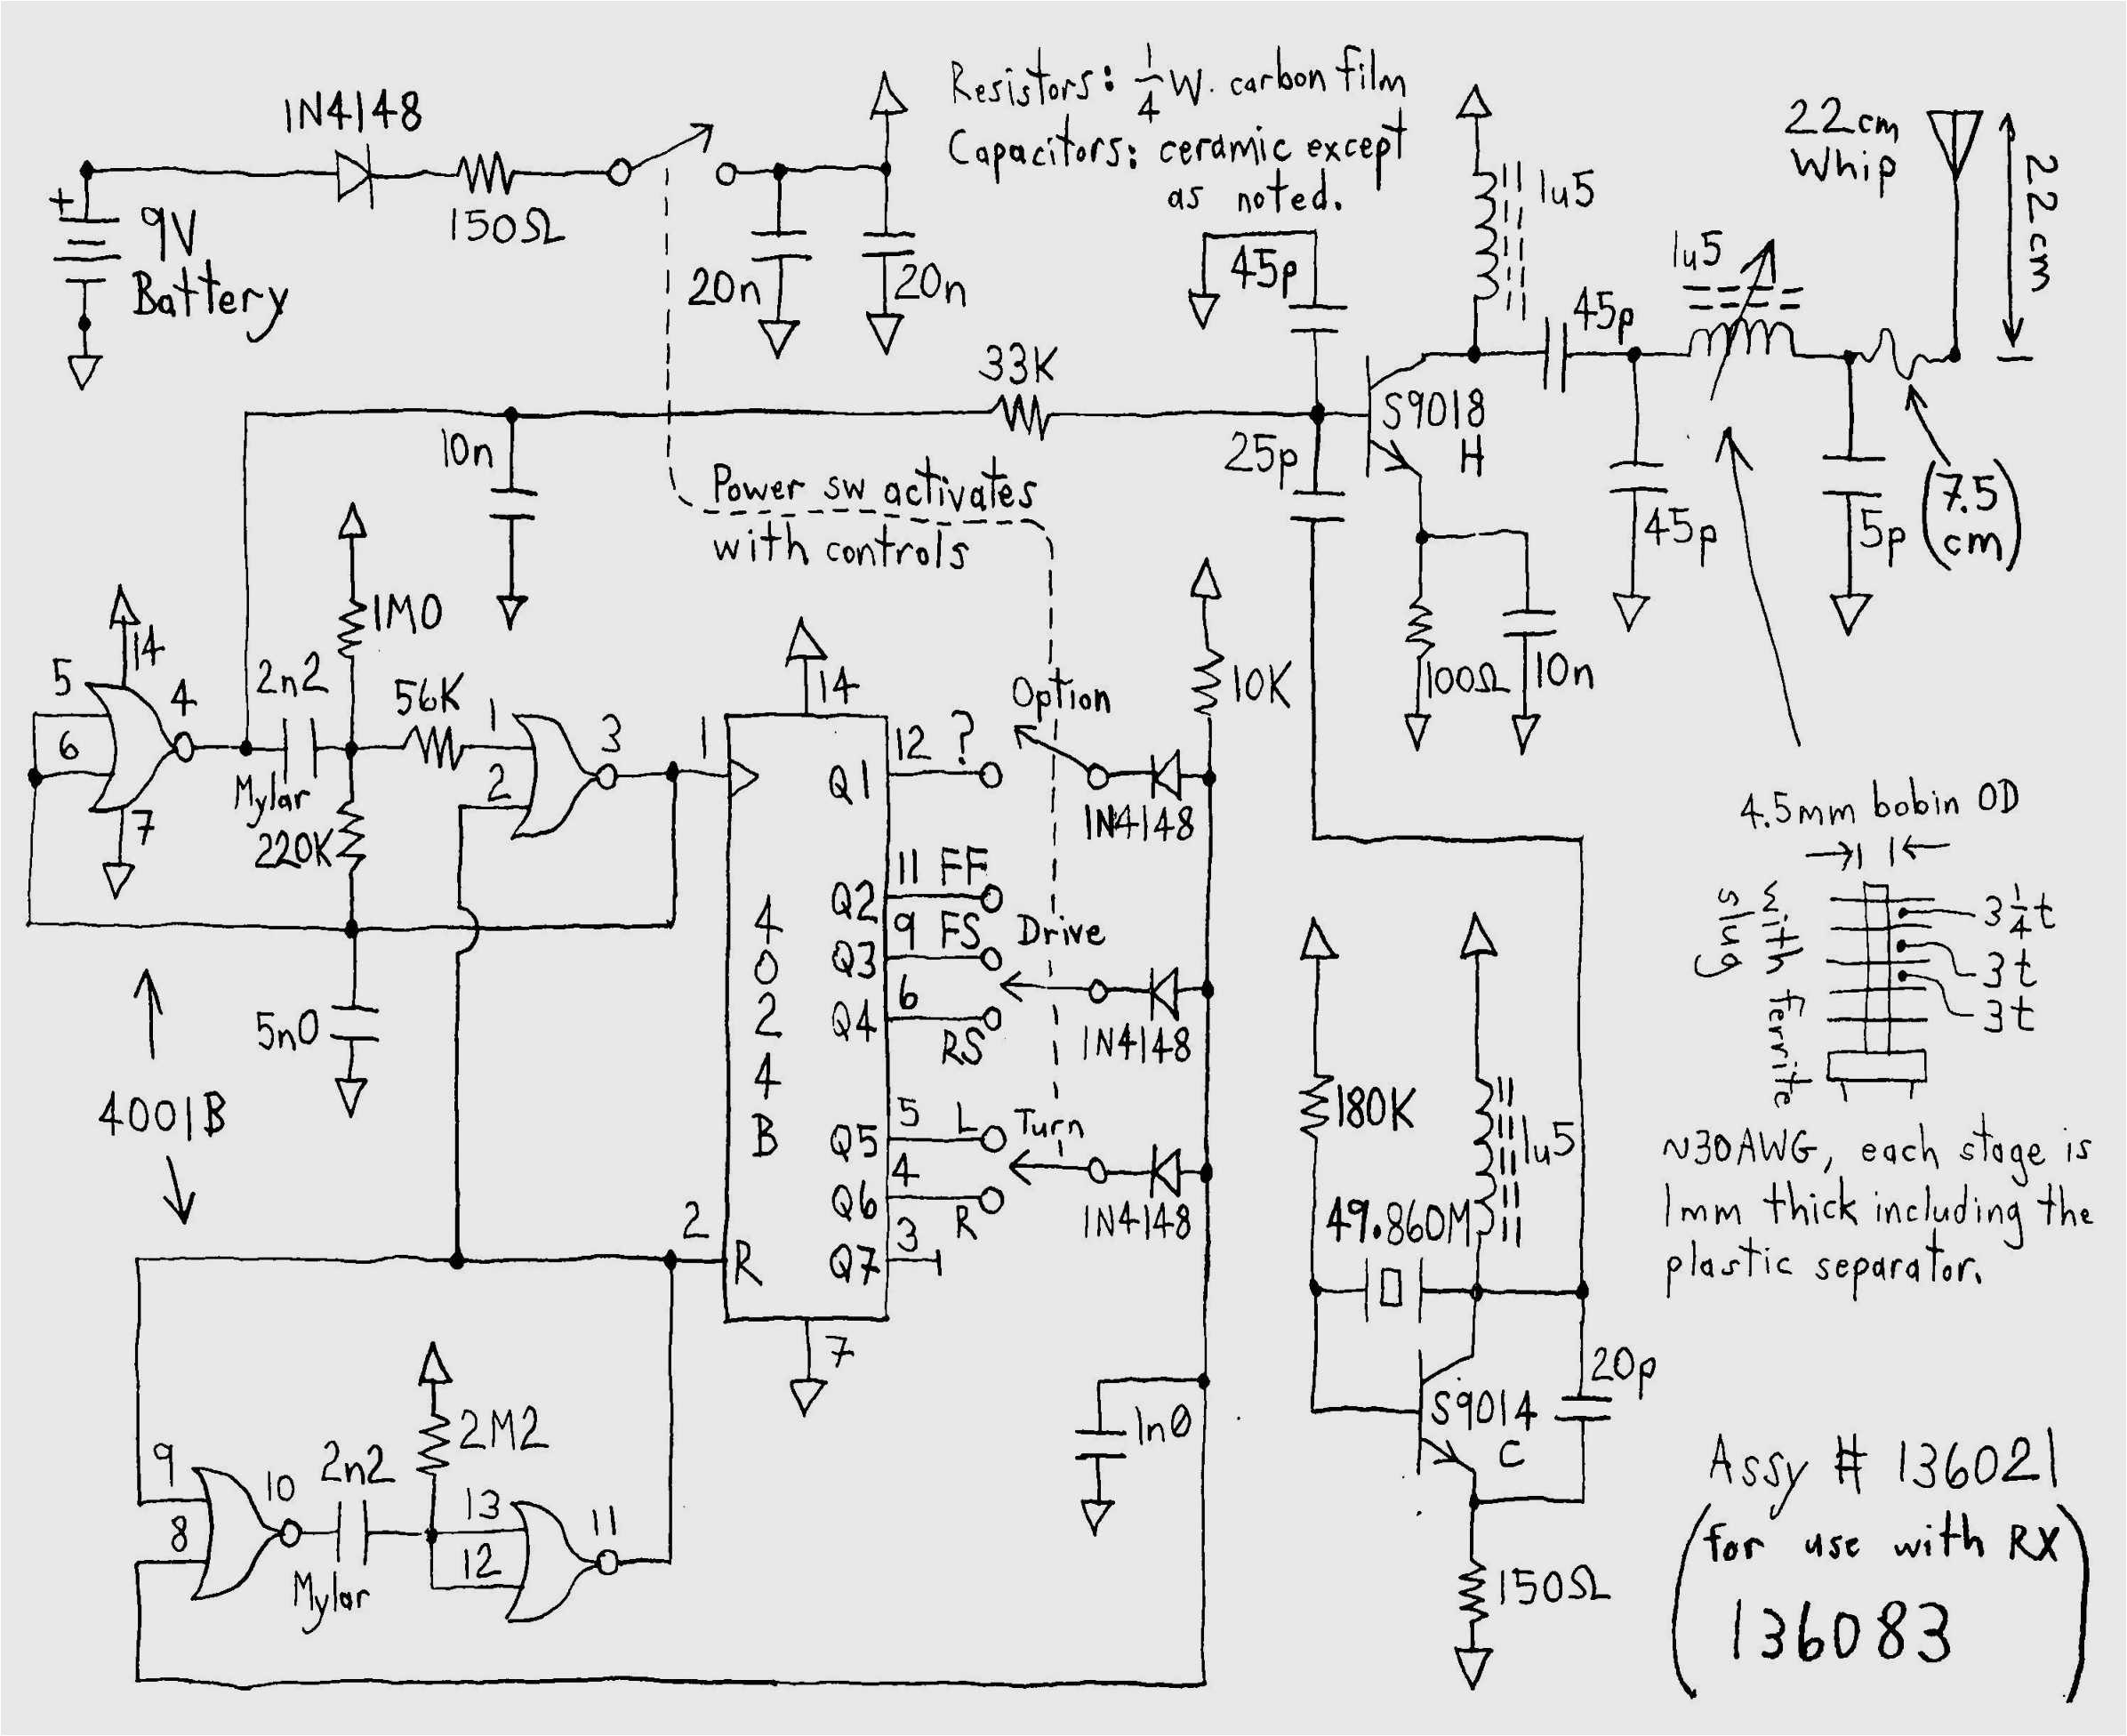 truck to trailer wiring diagram 2001 chevy blazer wiring harness diy enthusiasts wiring diagrams u2022 rh okdrywall co 2001 chevy blazer trailer wiring